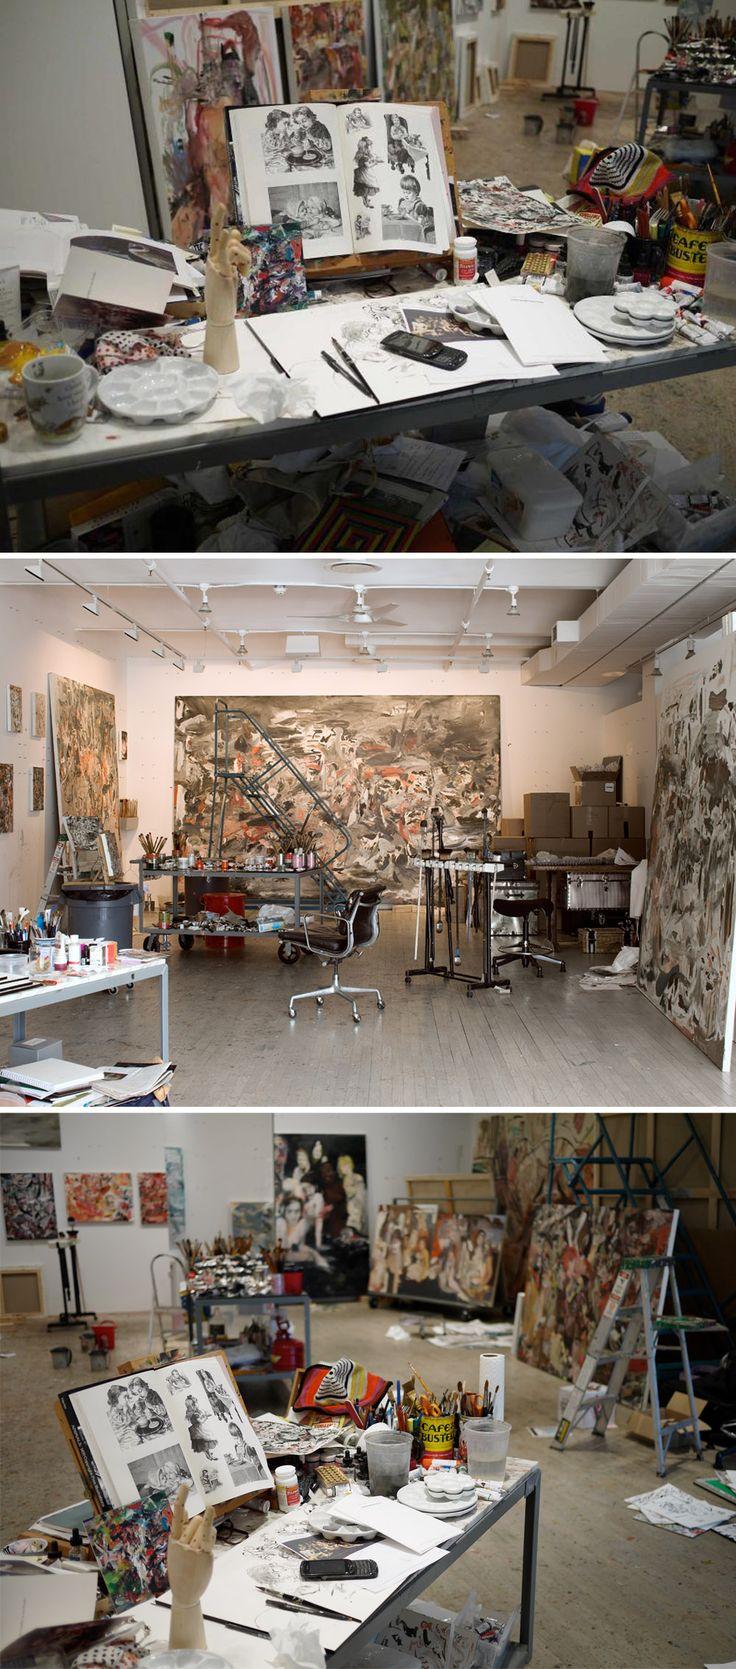 Studio: New York City, New York: Cecily Brown - British painter. (http://www.gagosian.com/artists/cecily-brown)